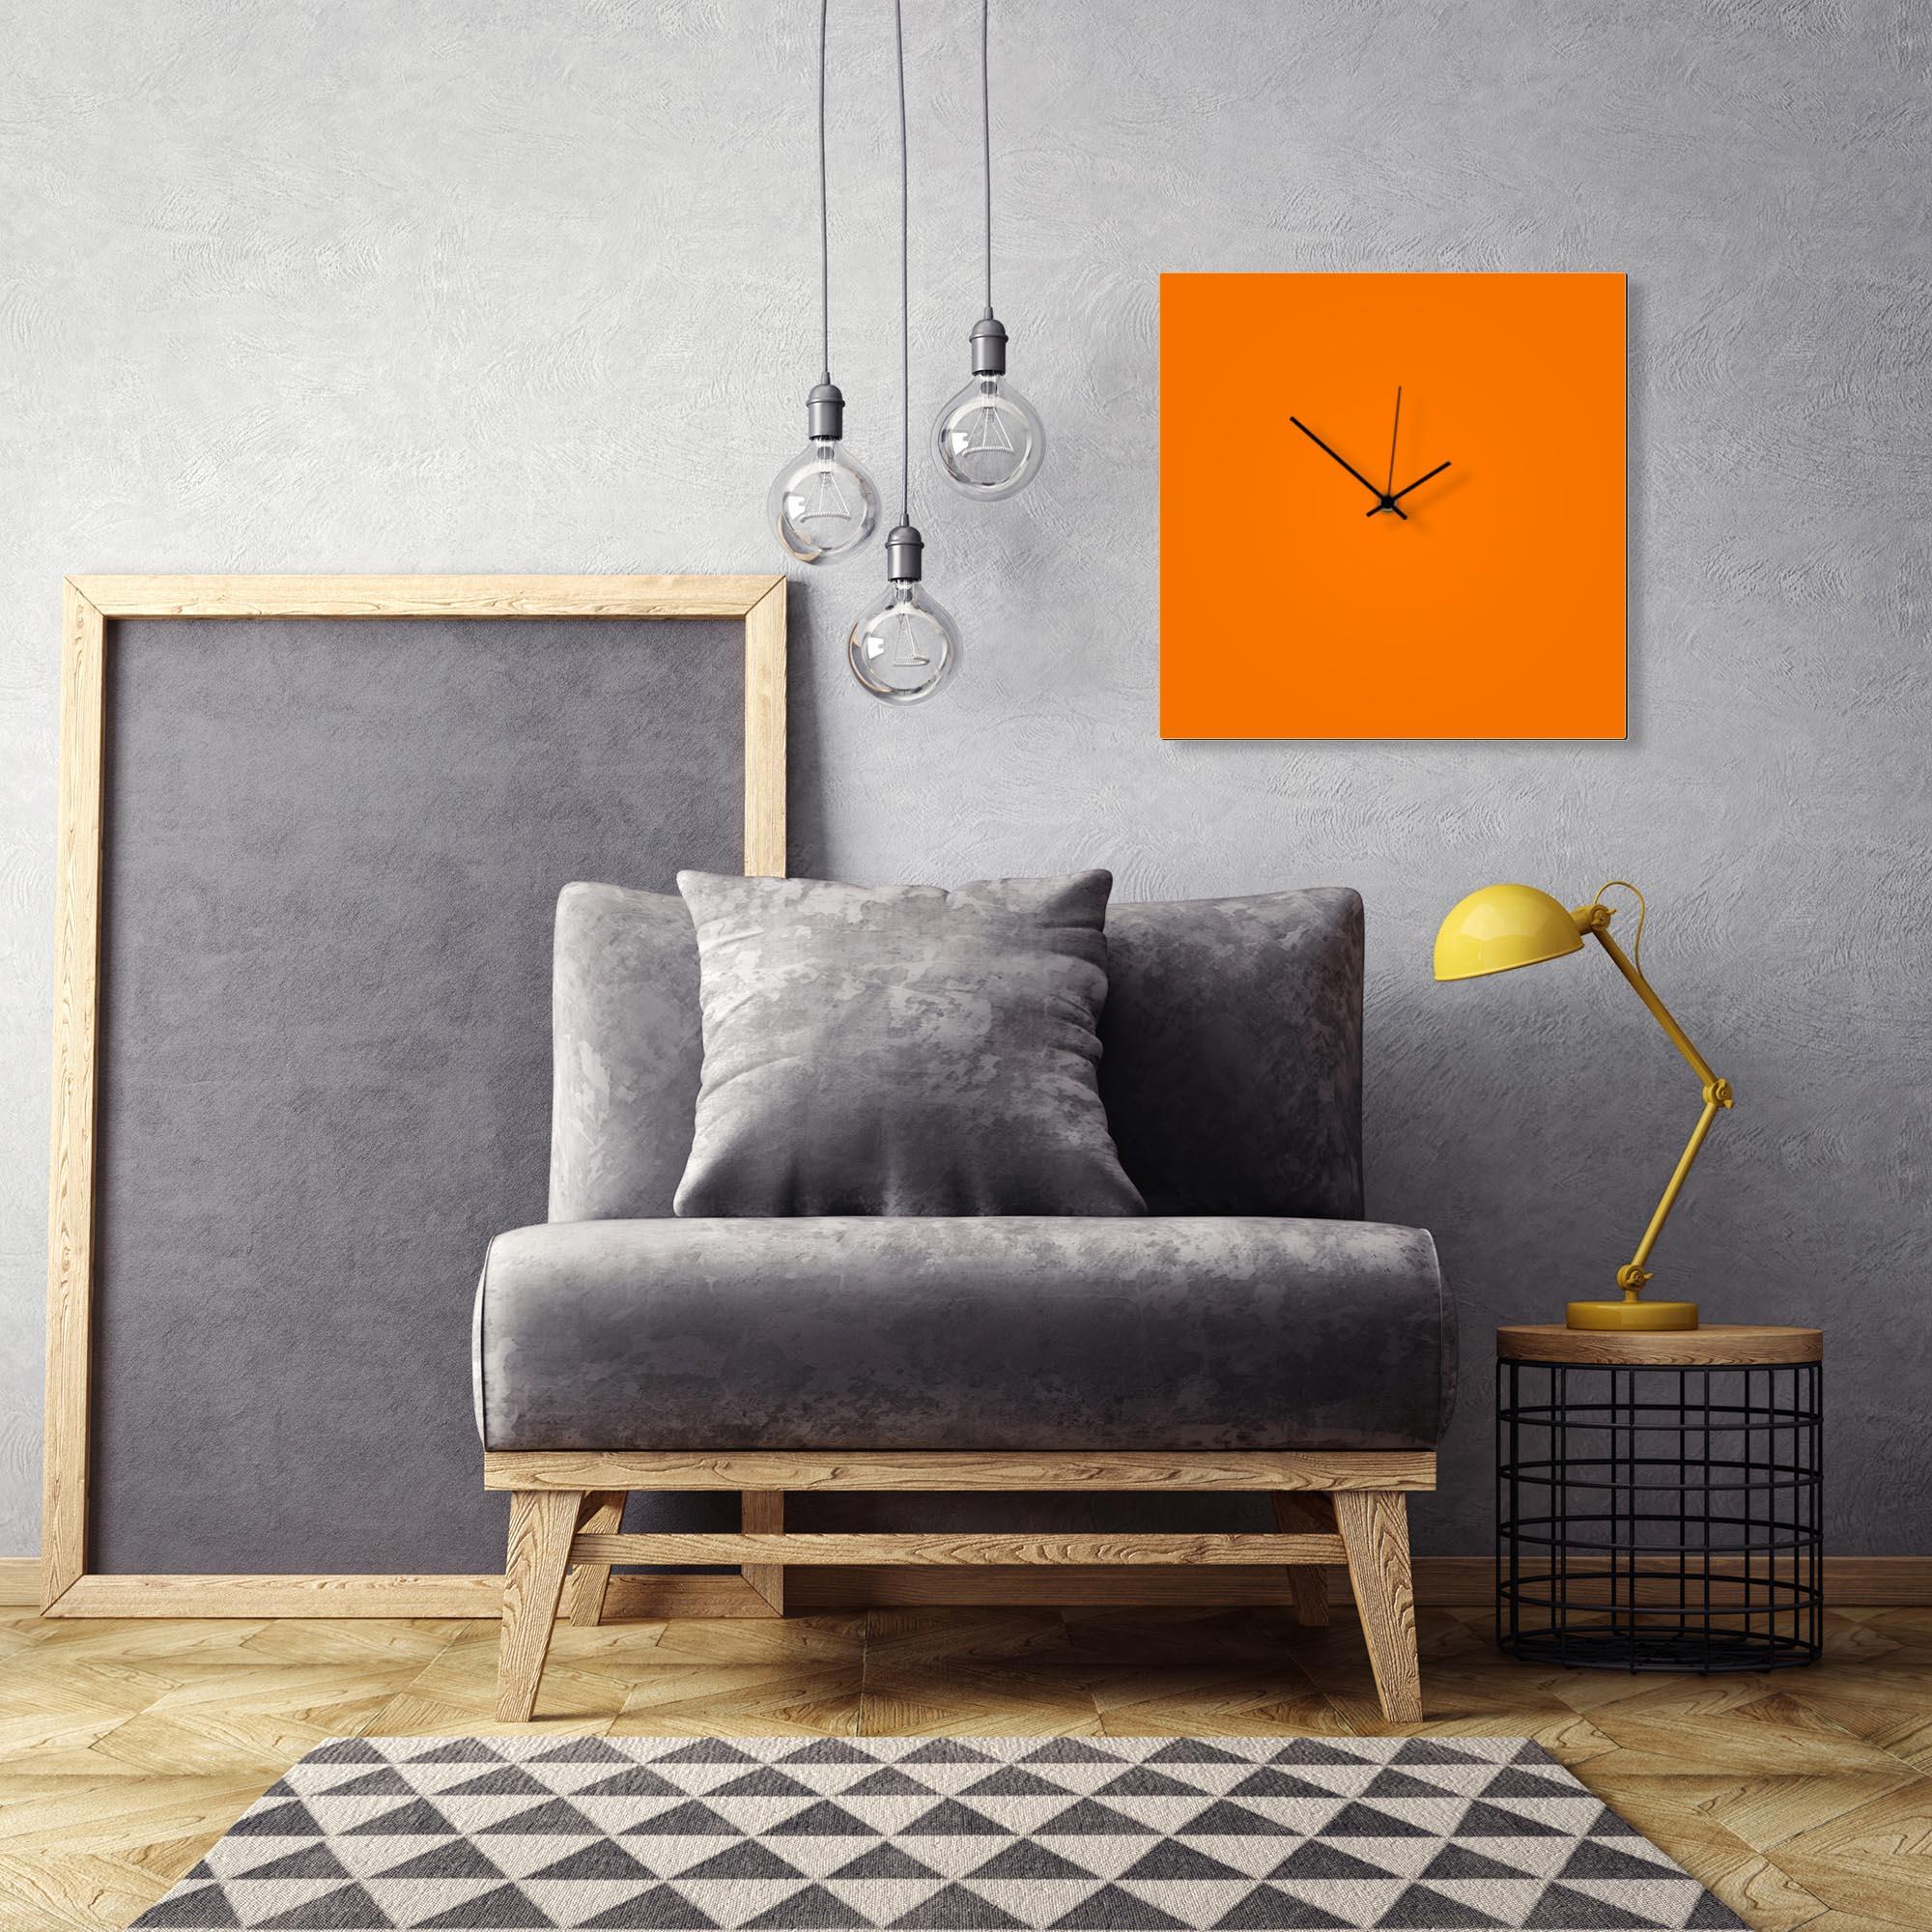 Orangeout Black Square Clock Large by Adam Schwoeppe Contemporary Clock on Aluminum Polymetal - Alternate View 1